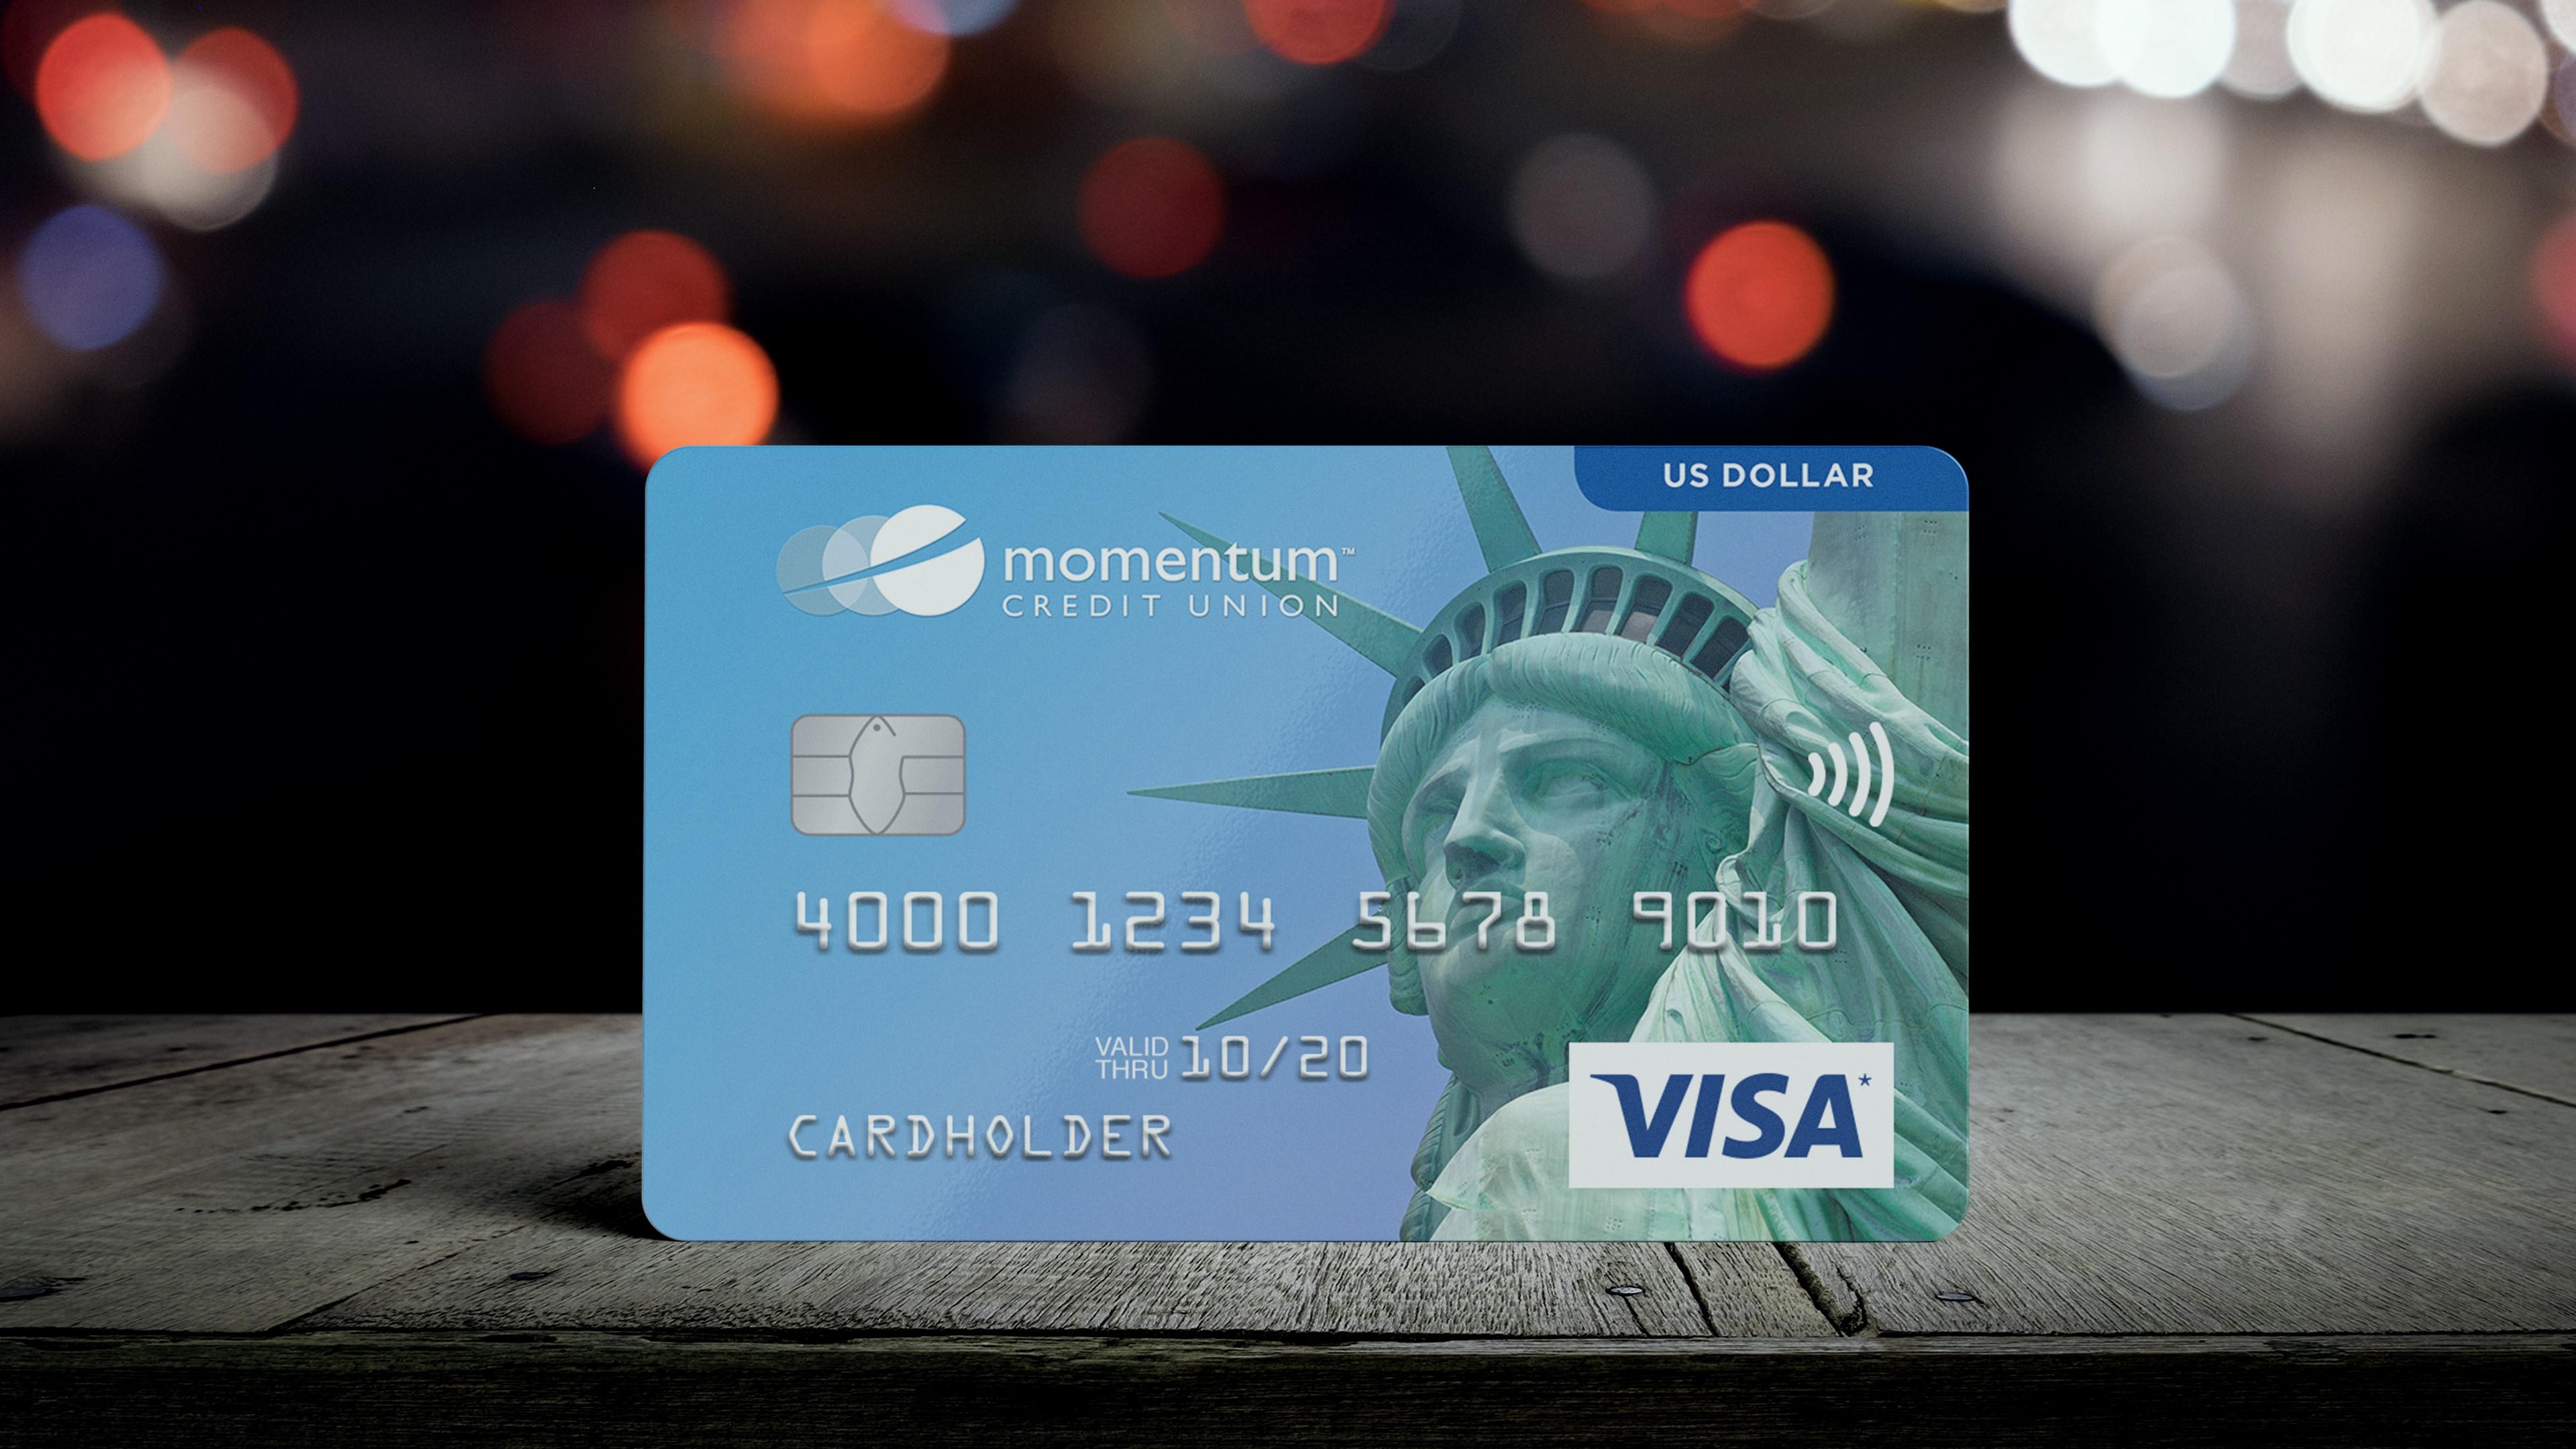 Momentum Visa US Dollar